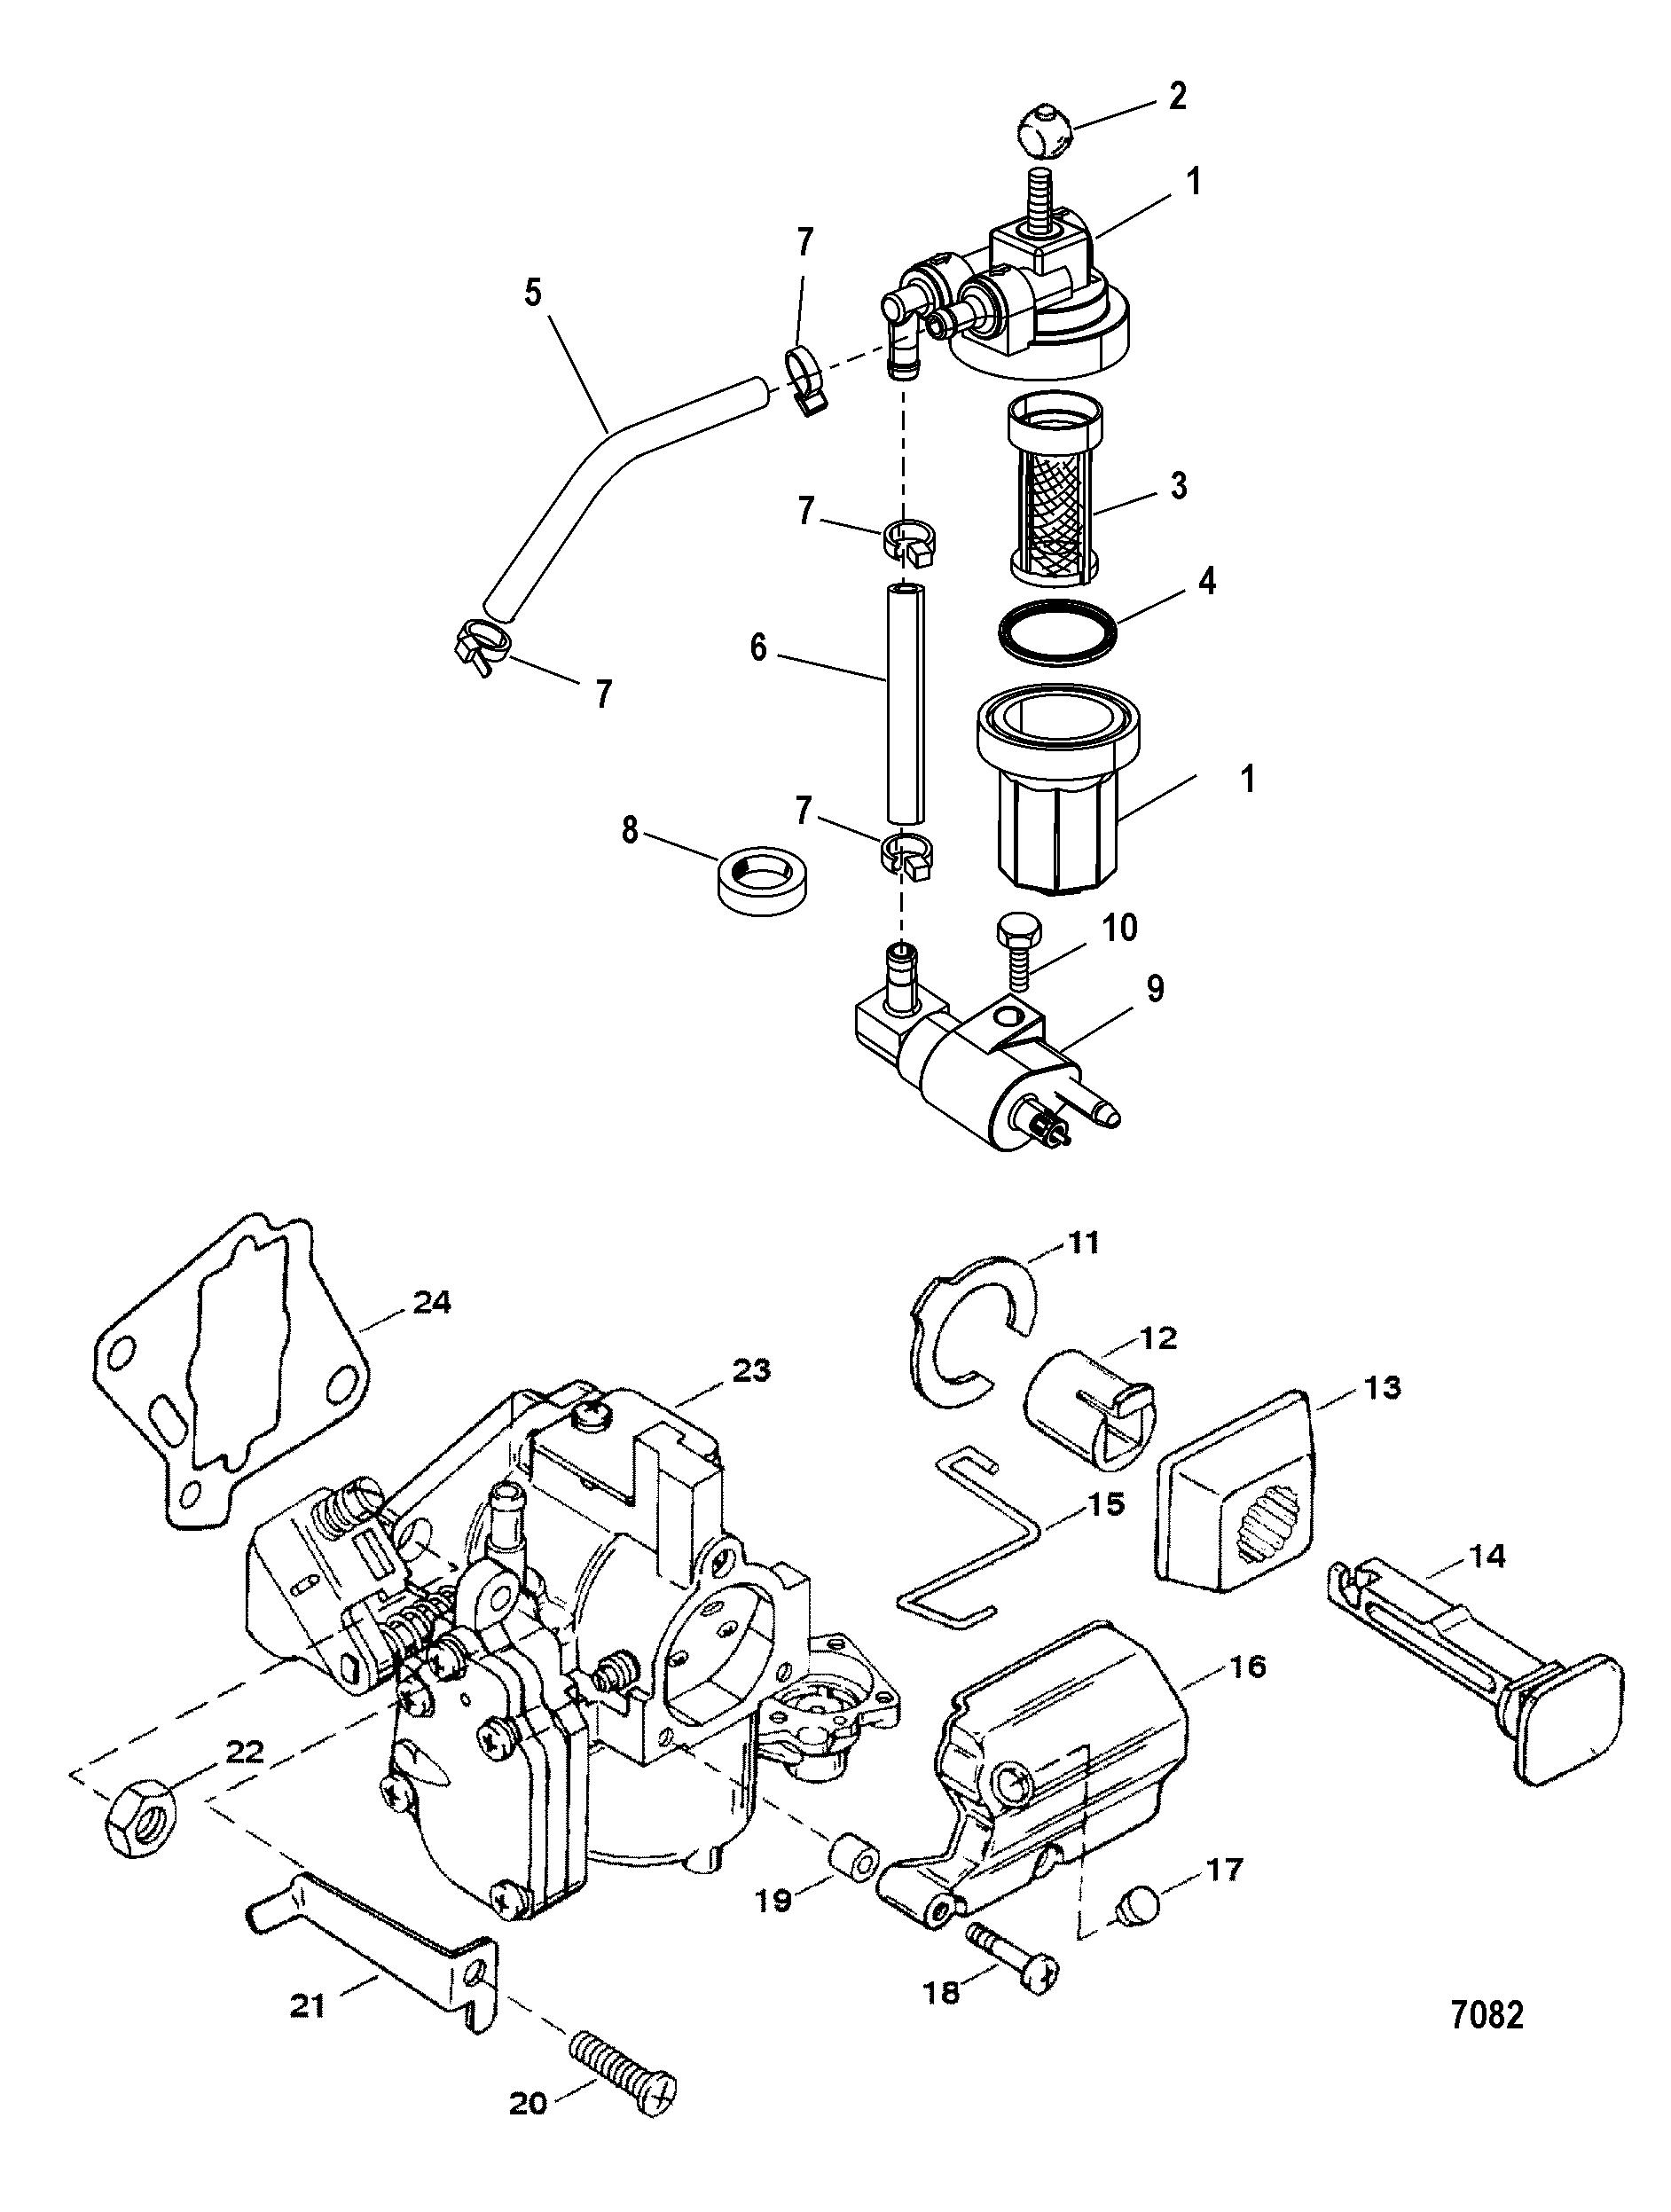 fuel system components commercial engines for mariner mercury 20 25 jet 20 seapro marathon